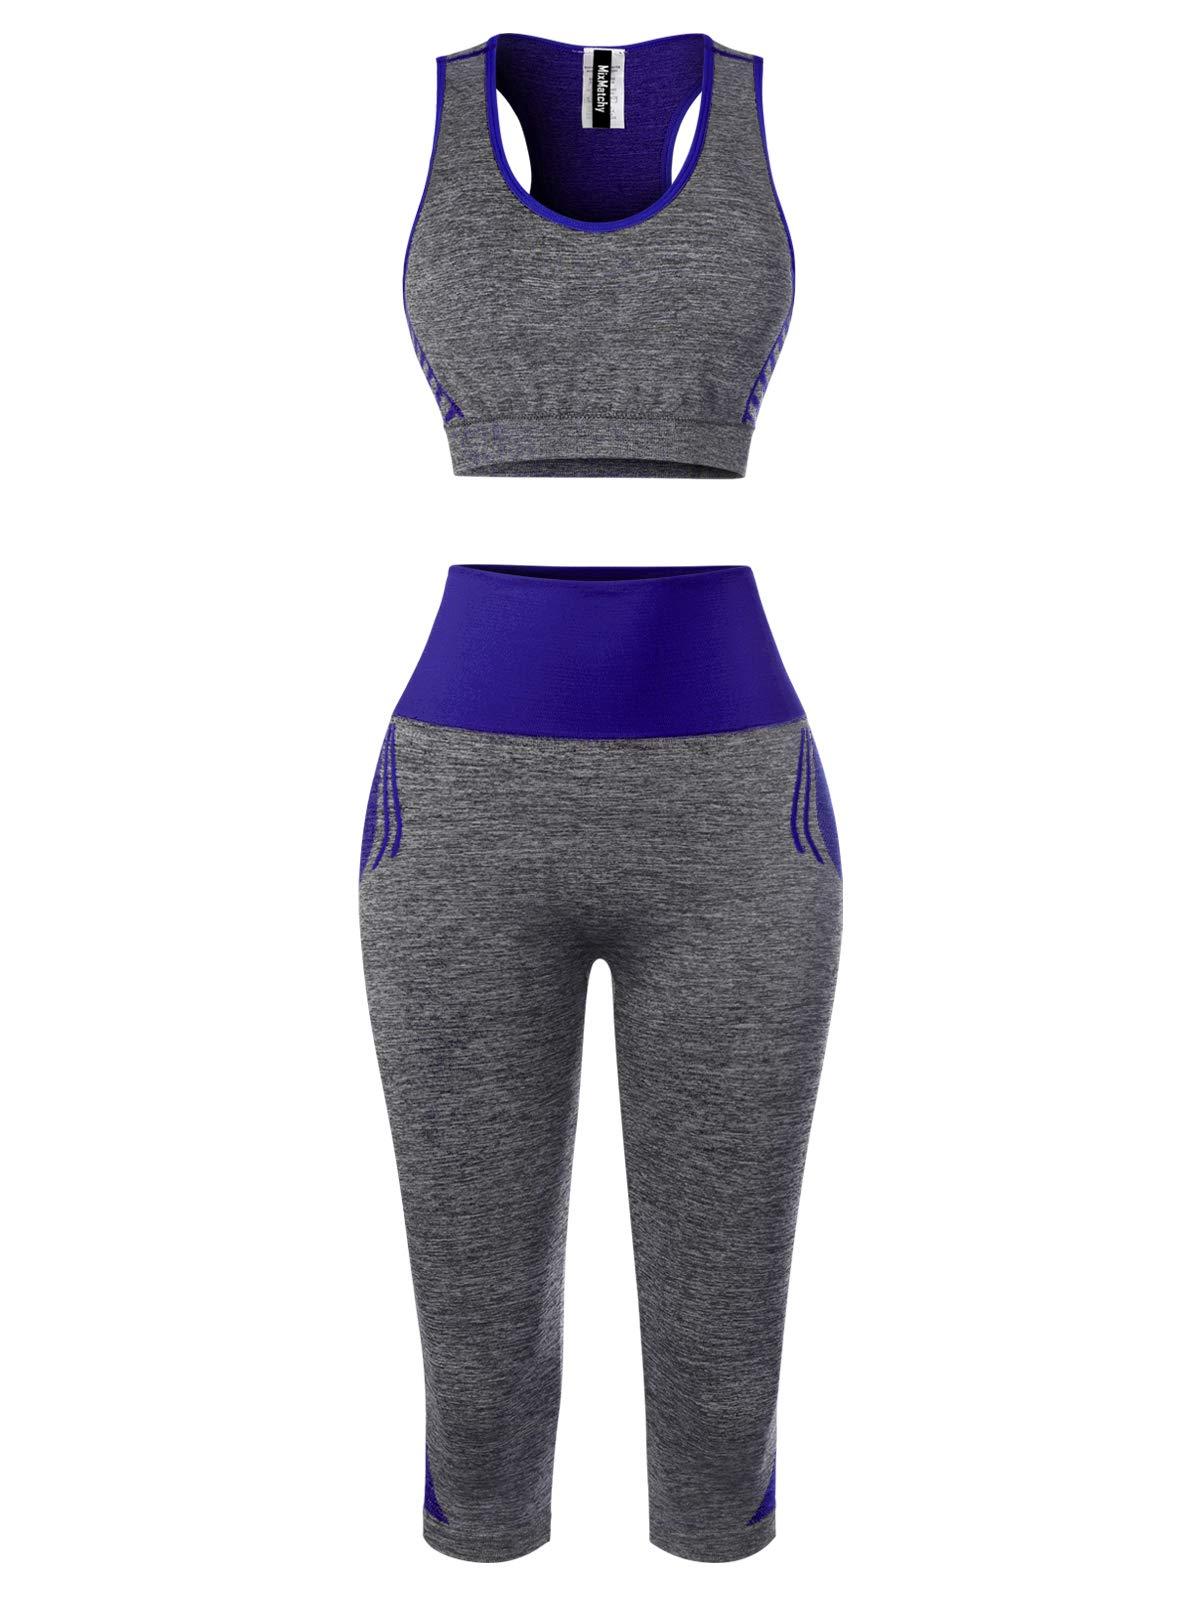 MixMatchy Women's Sports Gym Yoga Workout Activewear Sets Tank Crop Top & Capri Leggings Set Royal ONE by MixMatchy